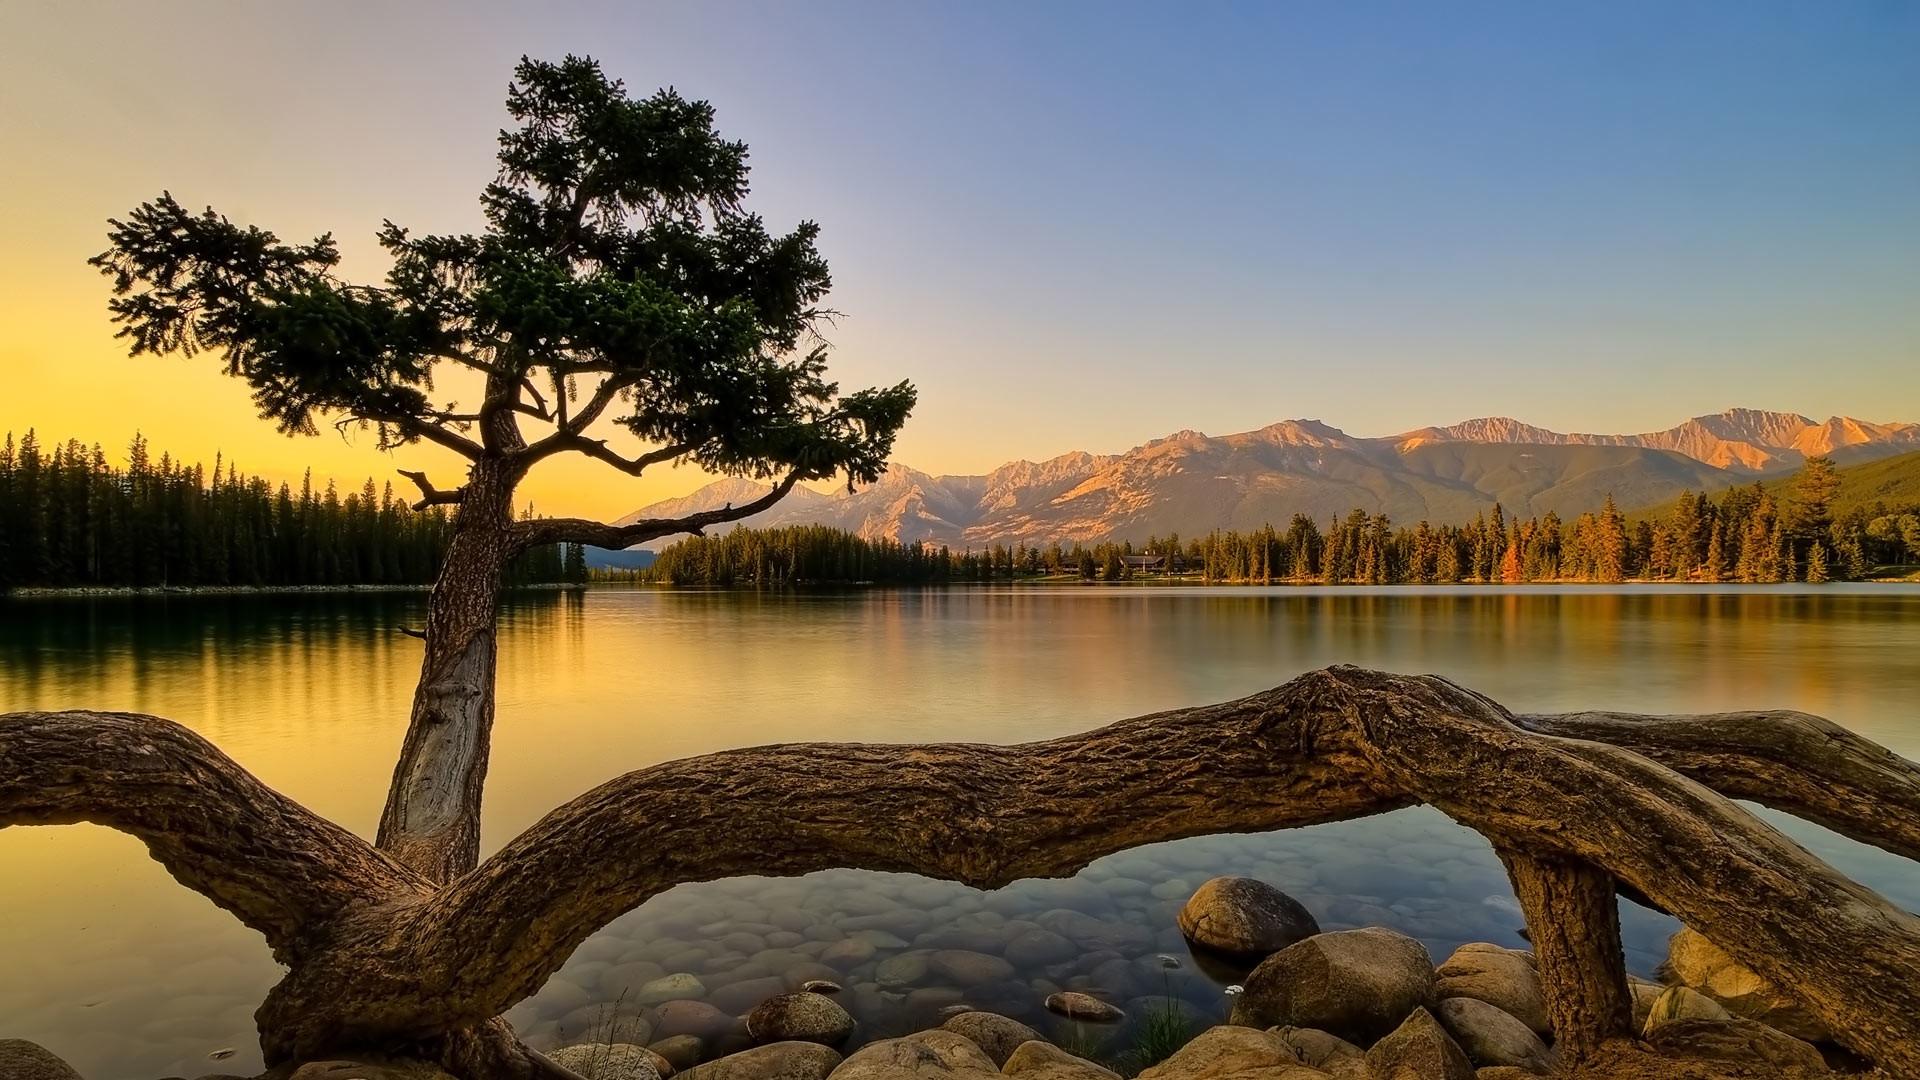 Desktop Backgrounds Nature Lakes – https://whatstrendingonline.com/desktop- backgrounds